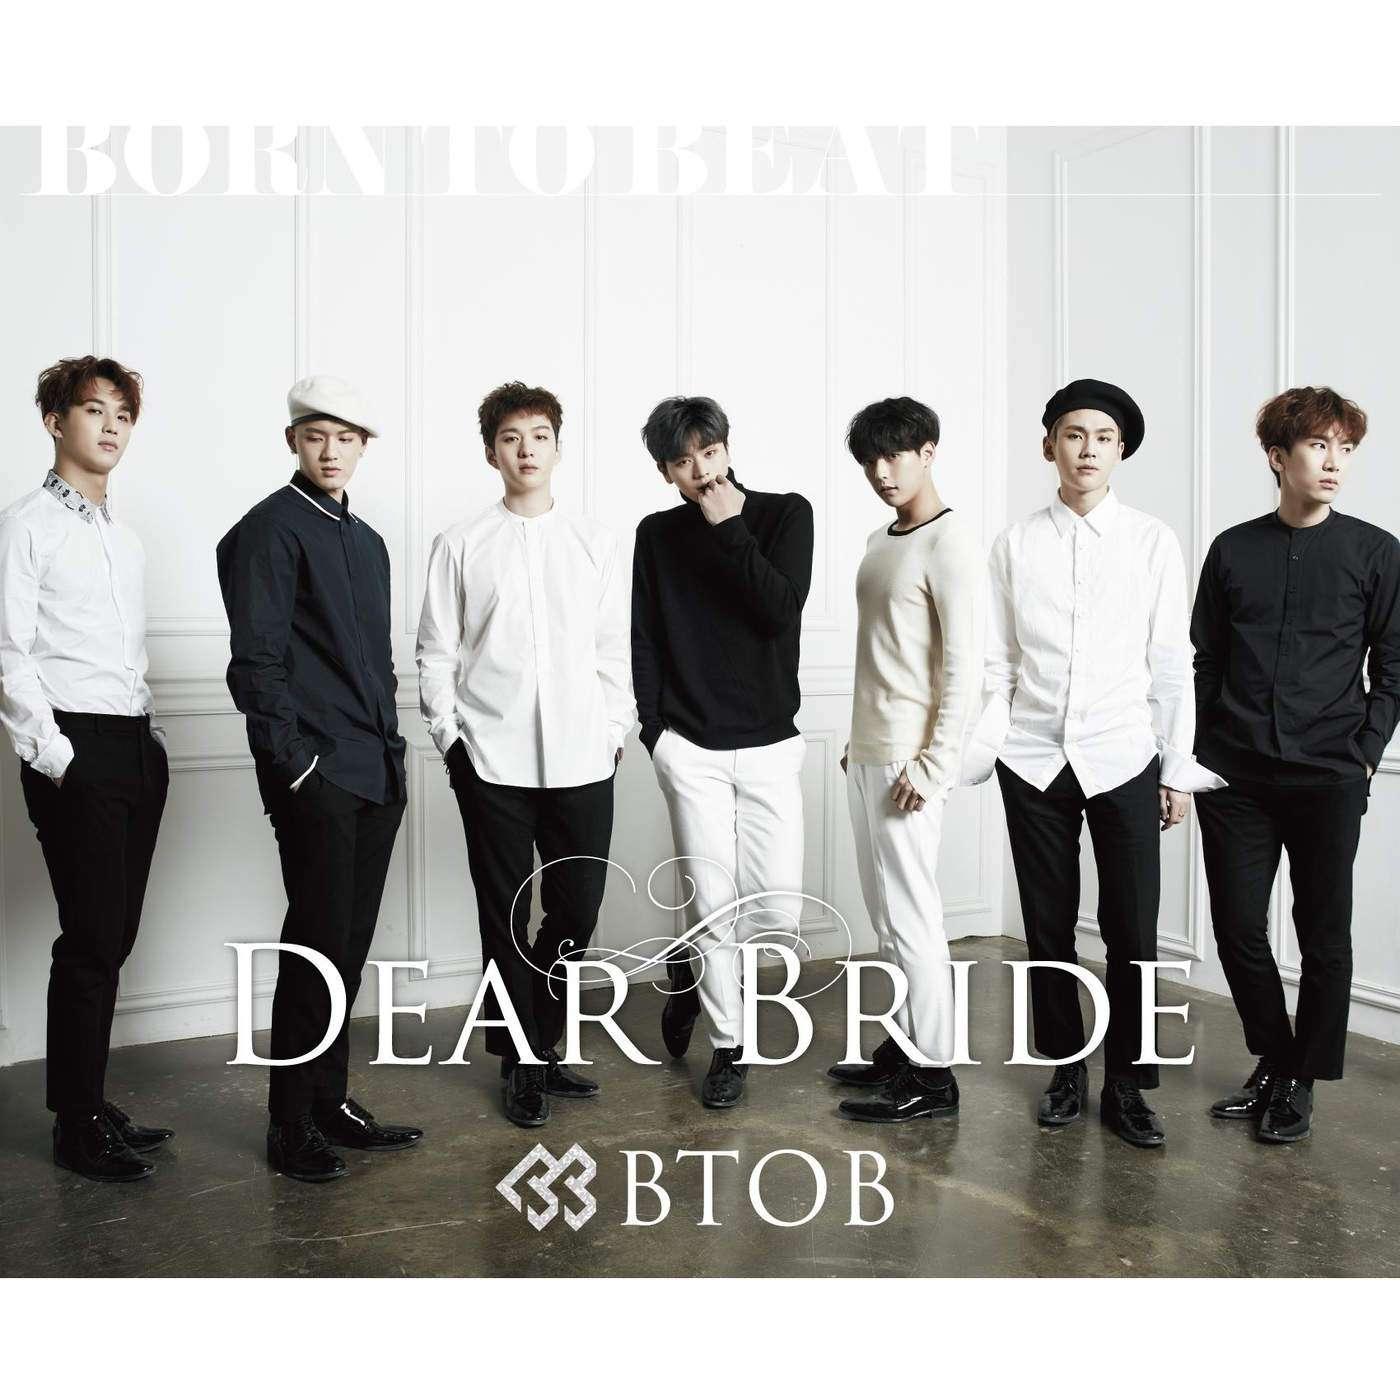 BTOB - Dear Bride (Japanese Single) K2Ost free mp3 download korean song kpop kdrama ost lyric 320 kbps